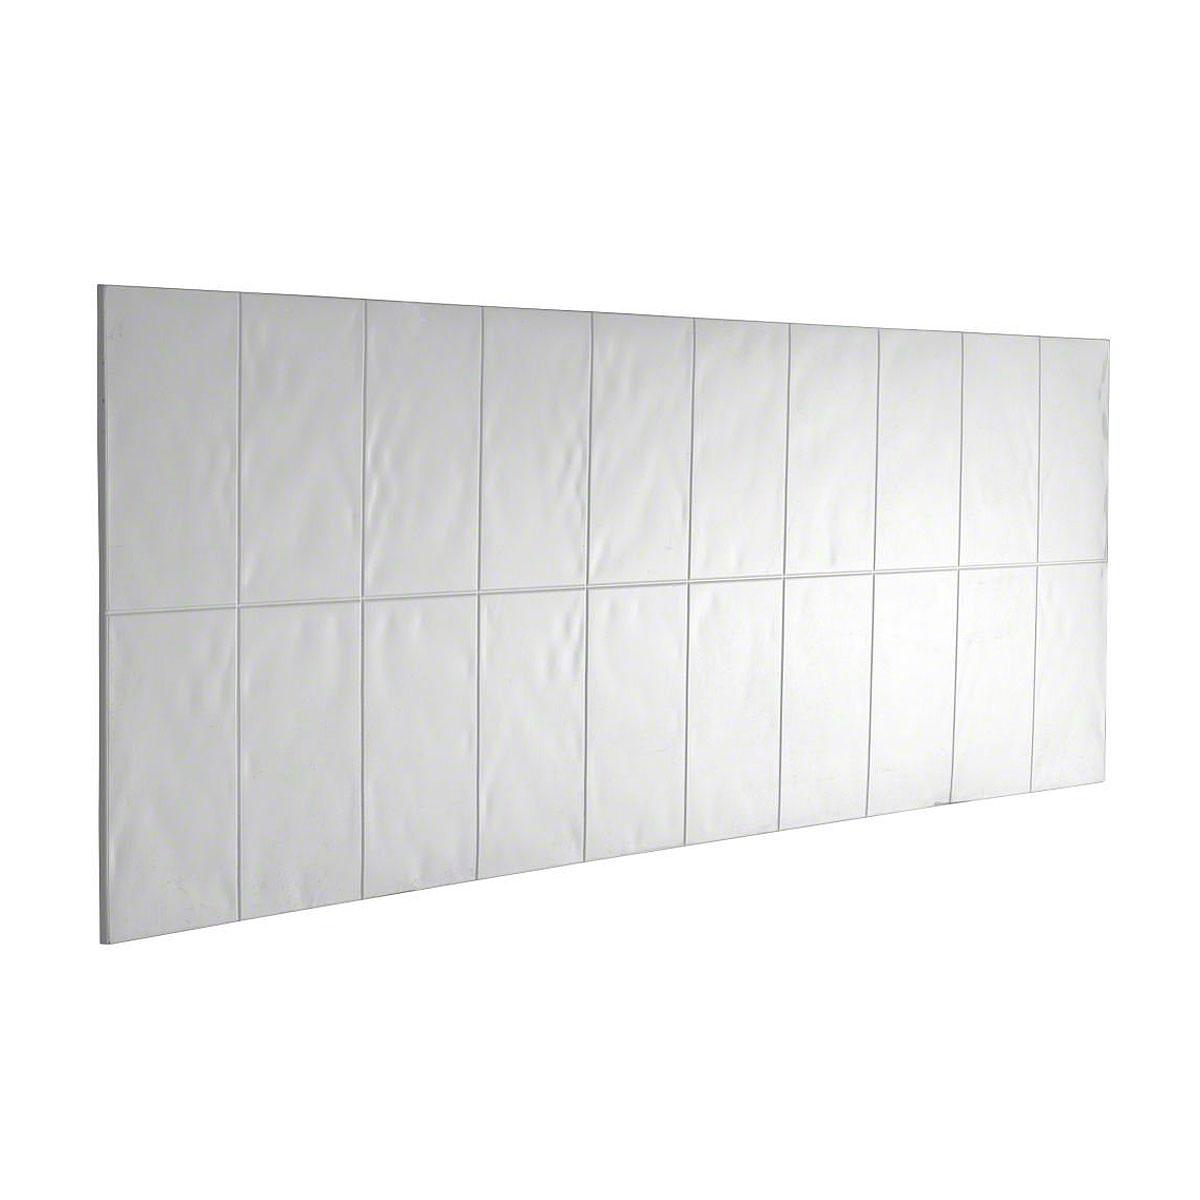 Flight Bathroom Door: Mira Flight Wall Bath Splash Back White Panel